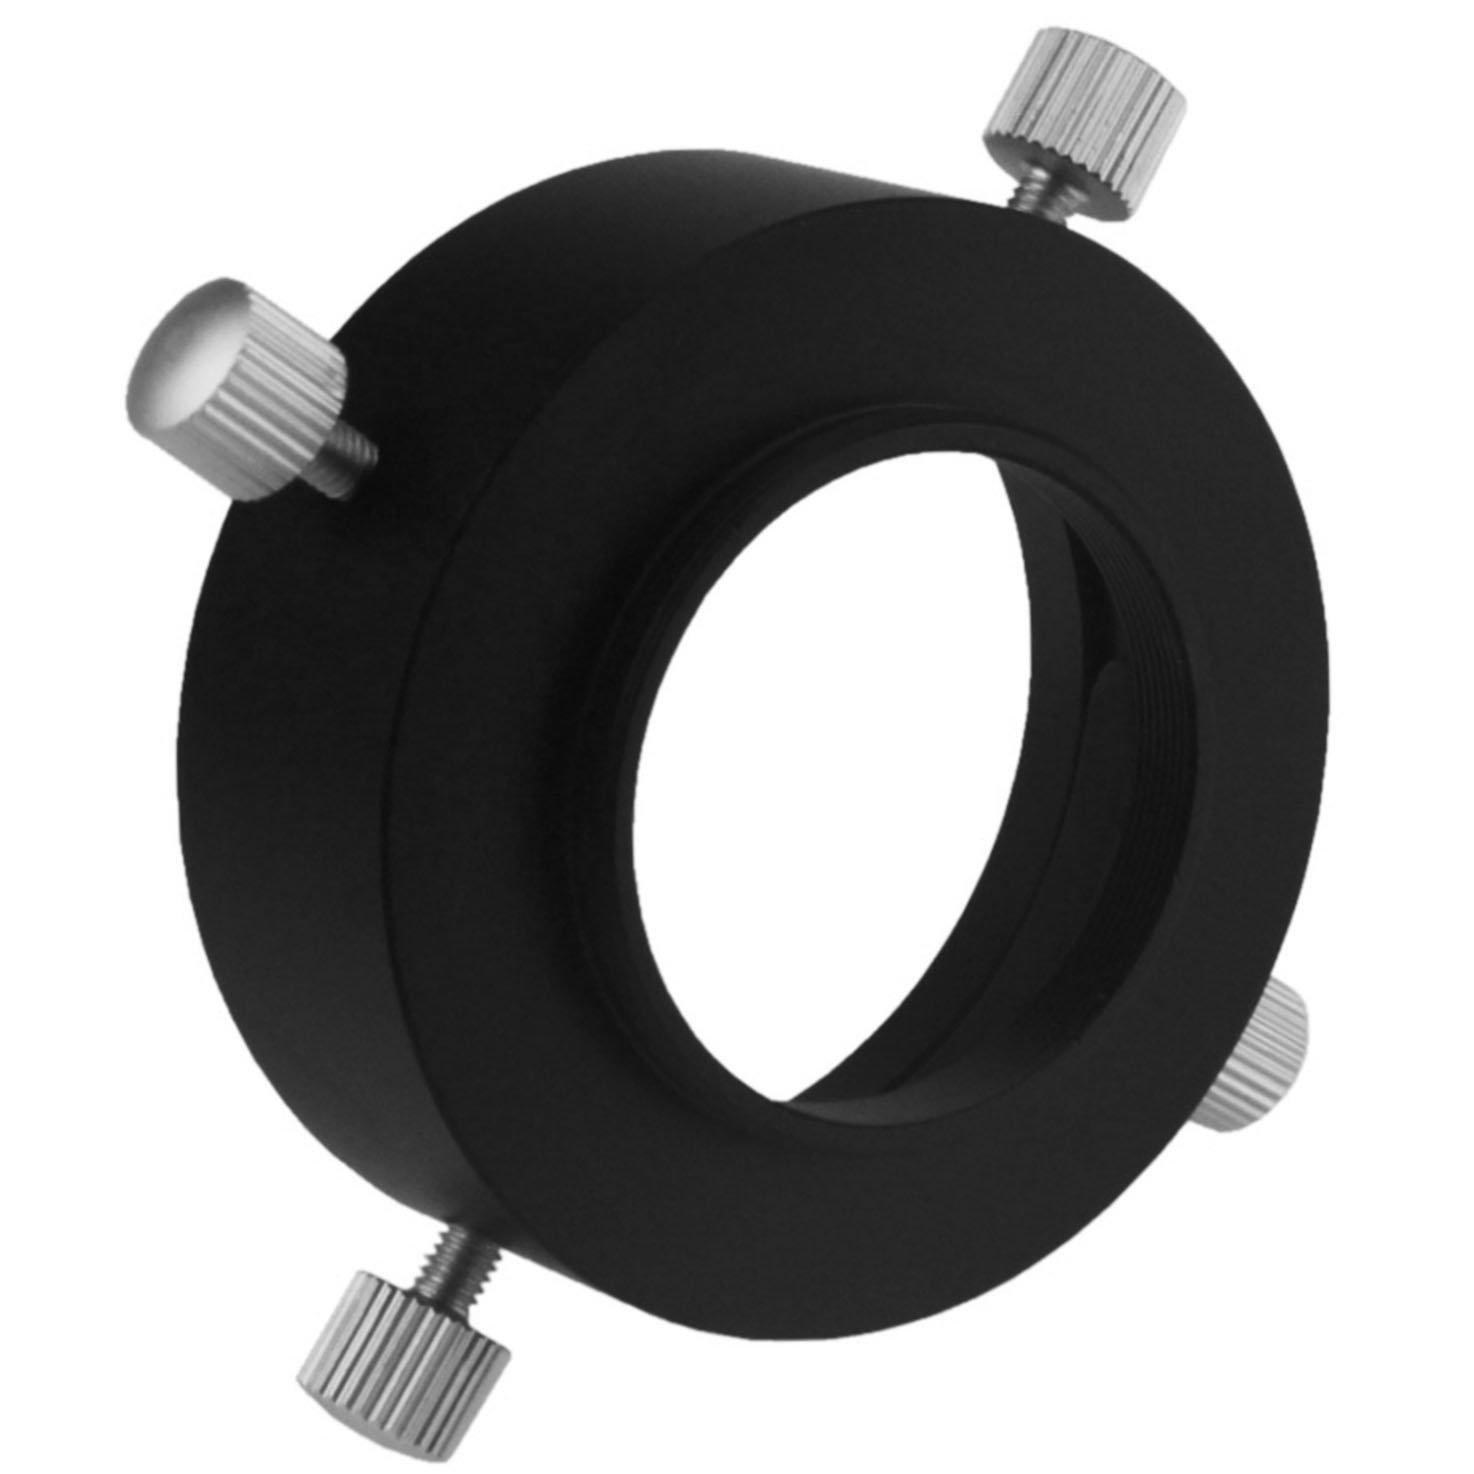 Stepping Ring Männlich 52mm zu Buchse T2 Objektivanschluss Adapter